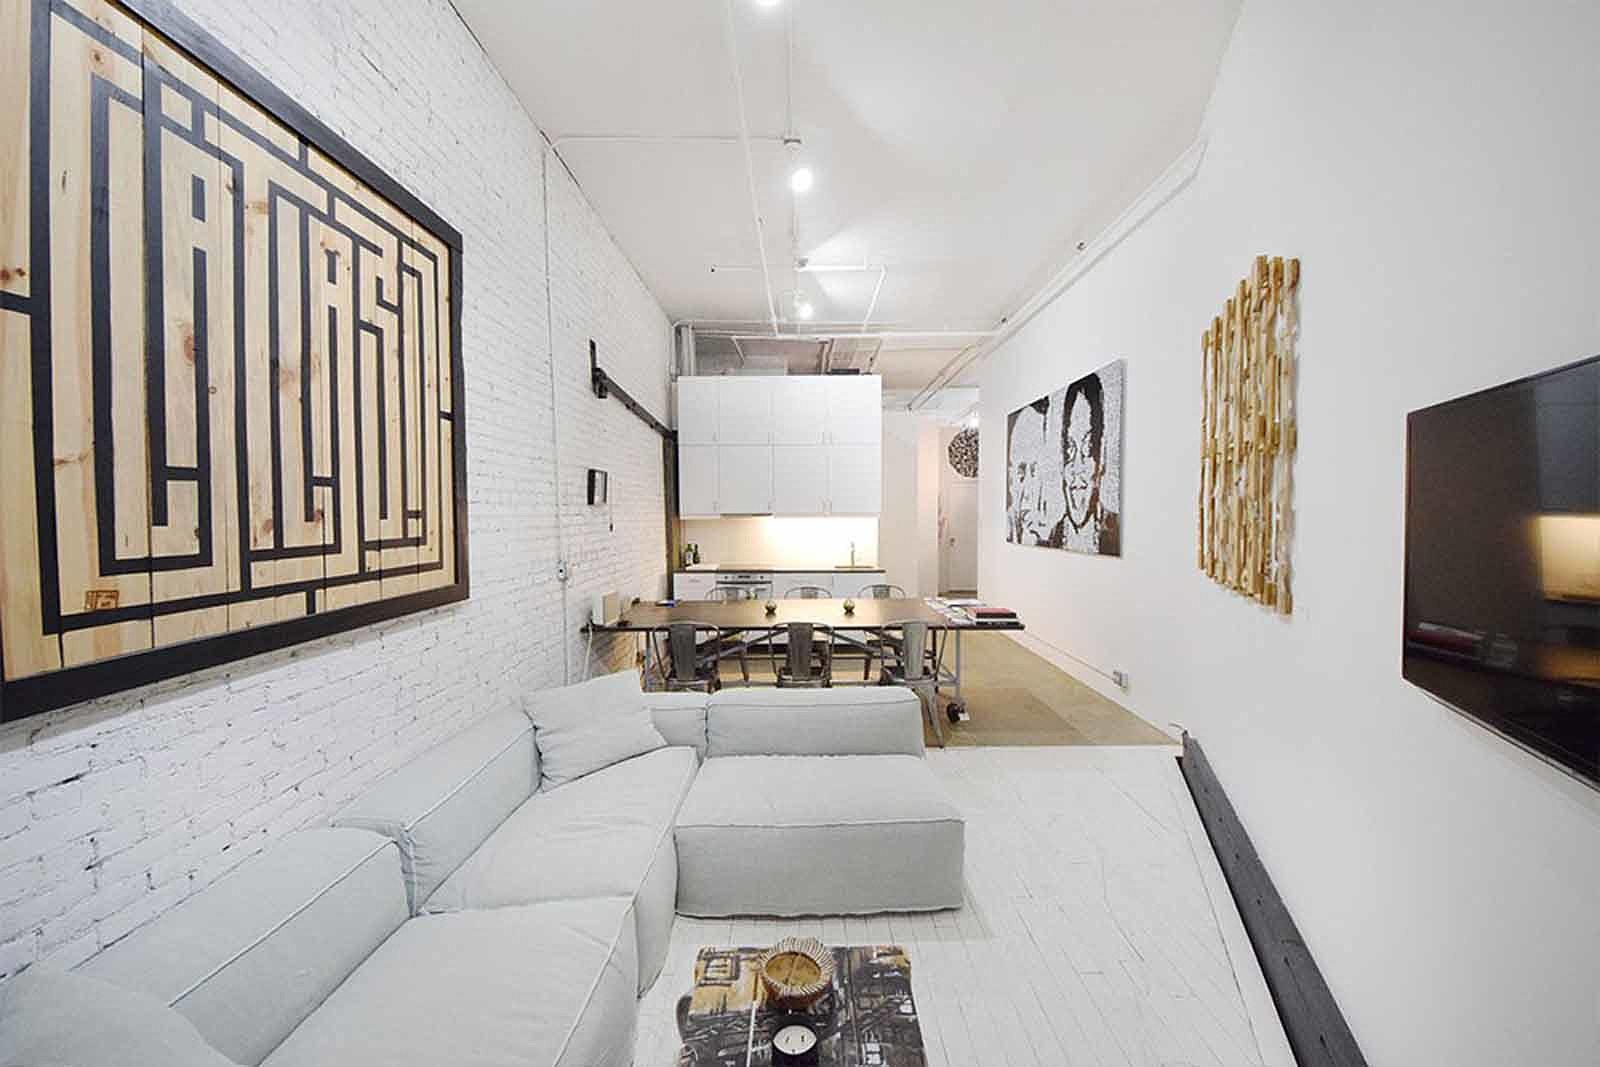 John Mellencamp Buys $2.3 Million 'Live-Work Space' in Manhattan